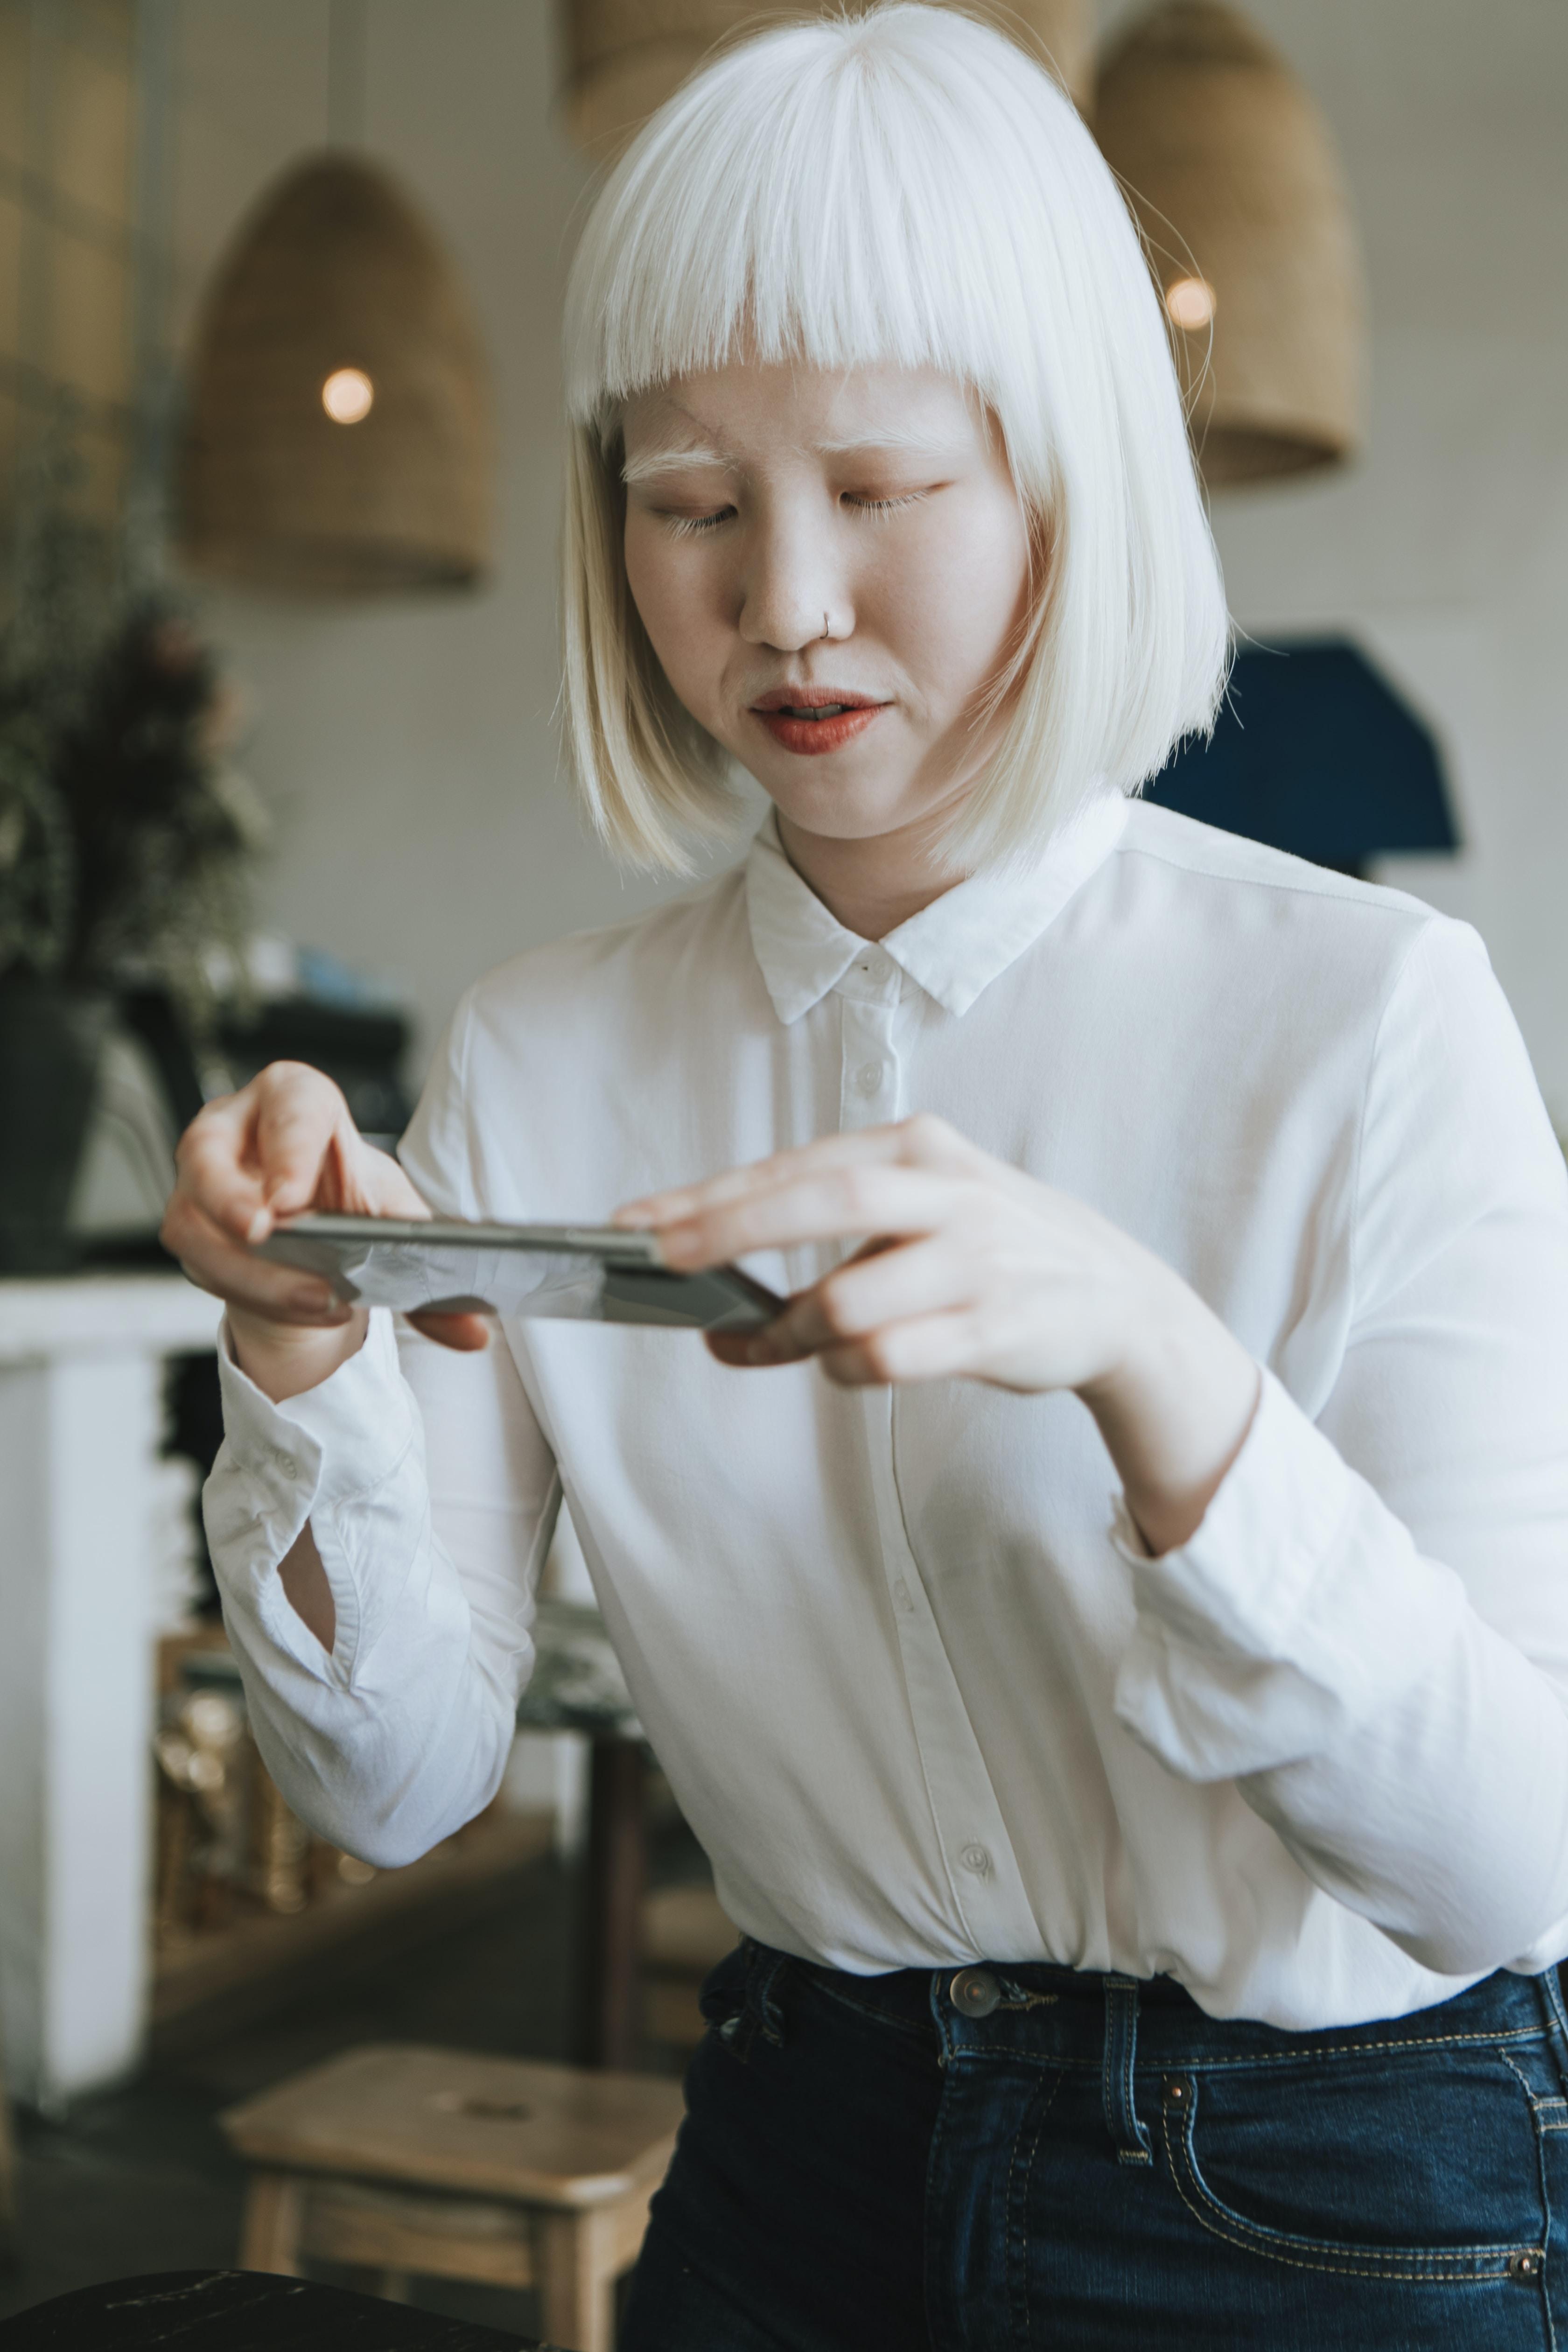 woman holding smartphone taking photo